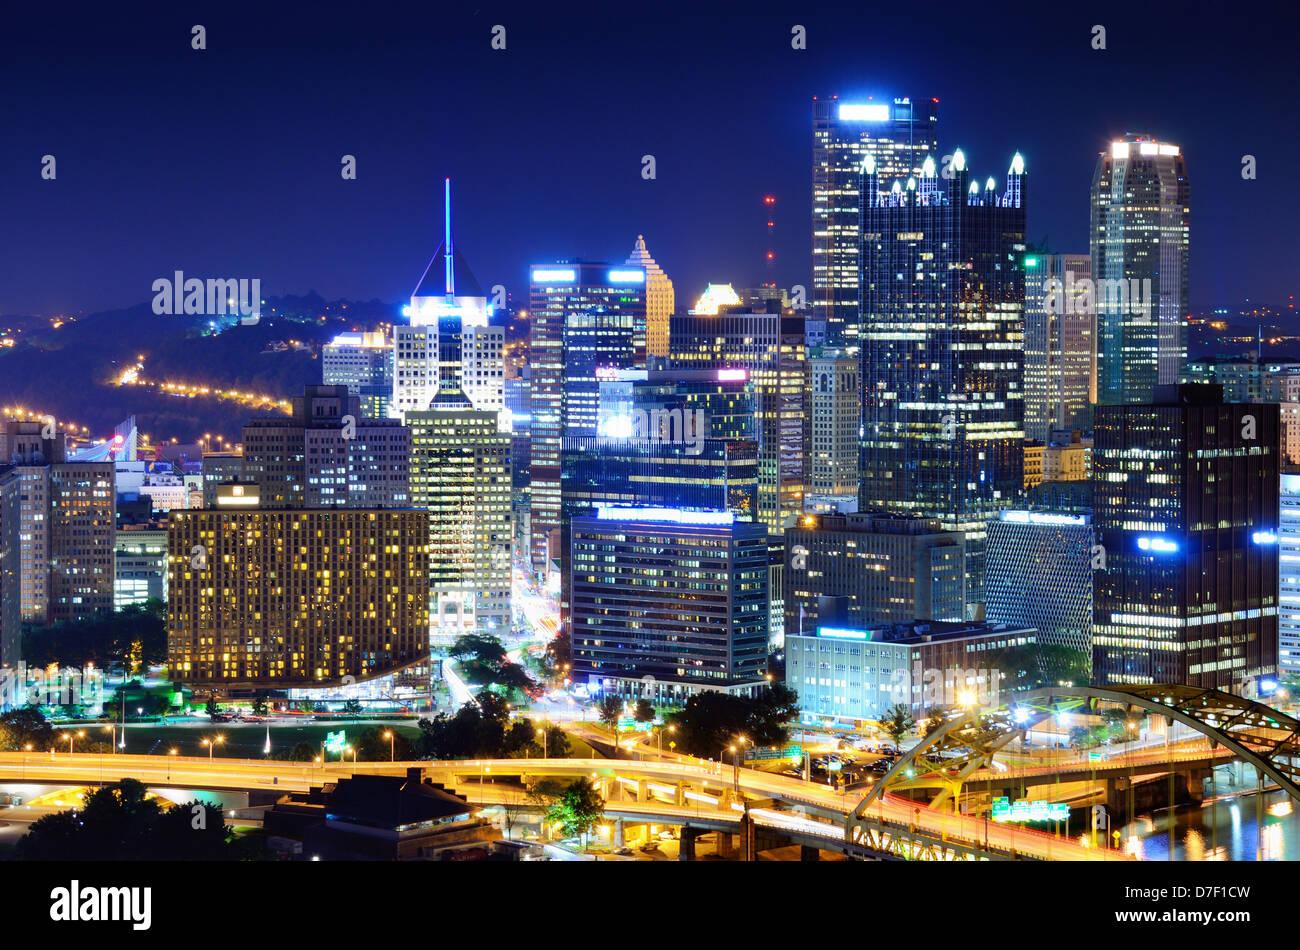 A Pittsburgh, Pennsylvanie, USA paysage urbain. Photo Stock